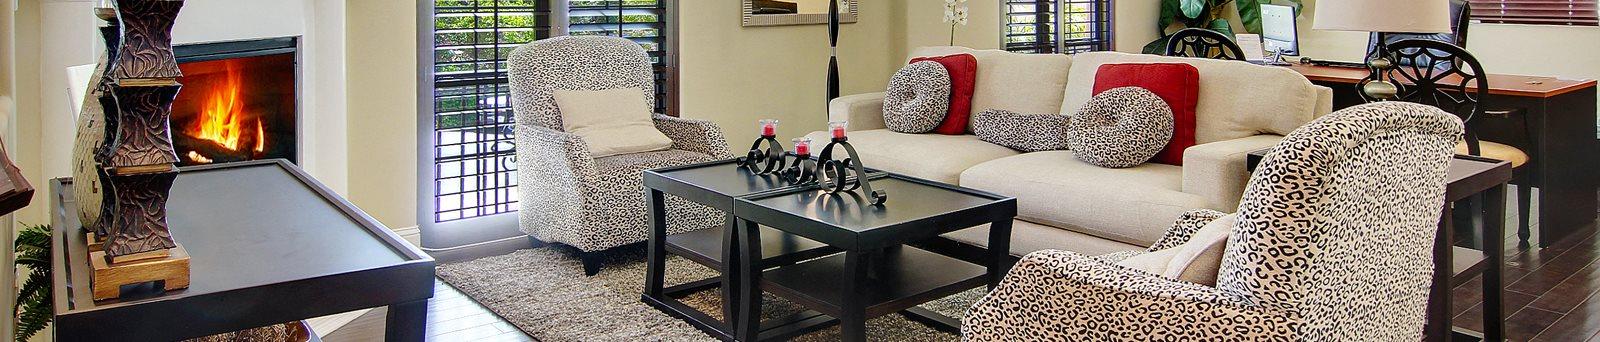 Vista Paradiso resident lounge